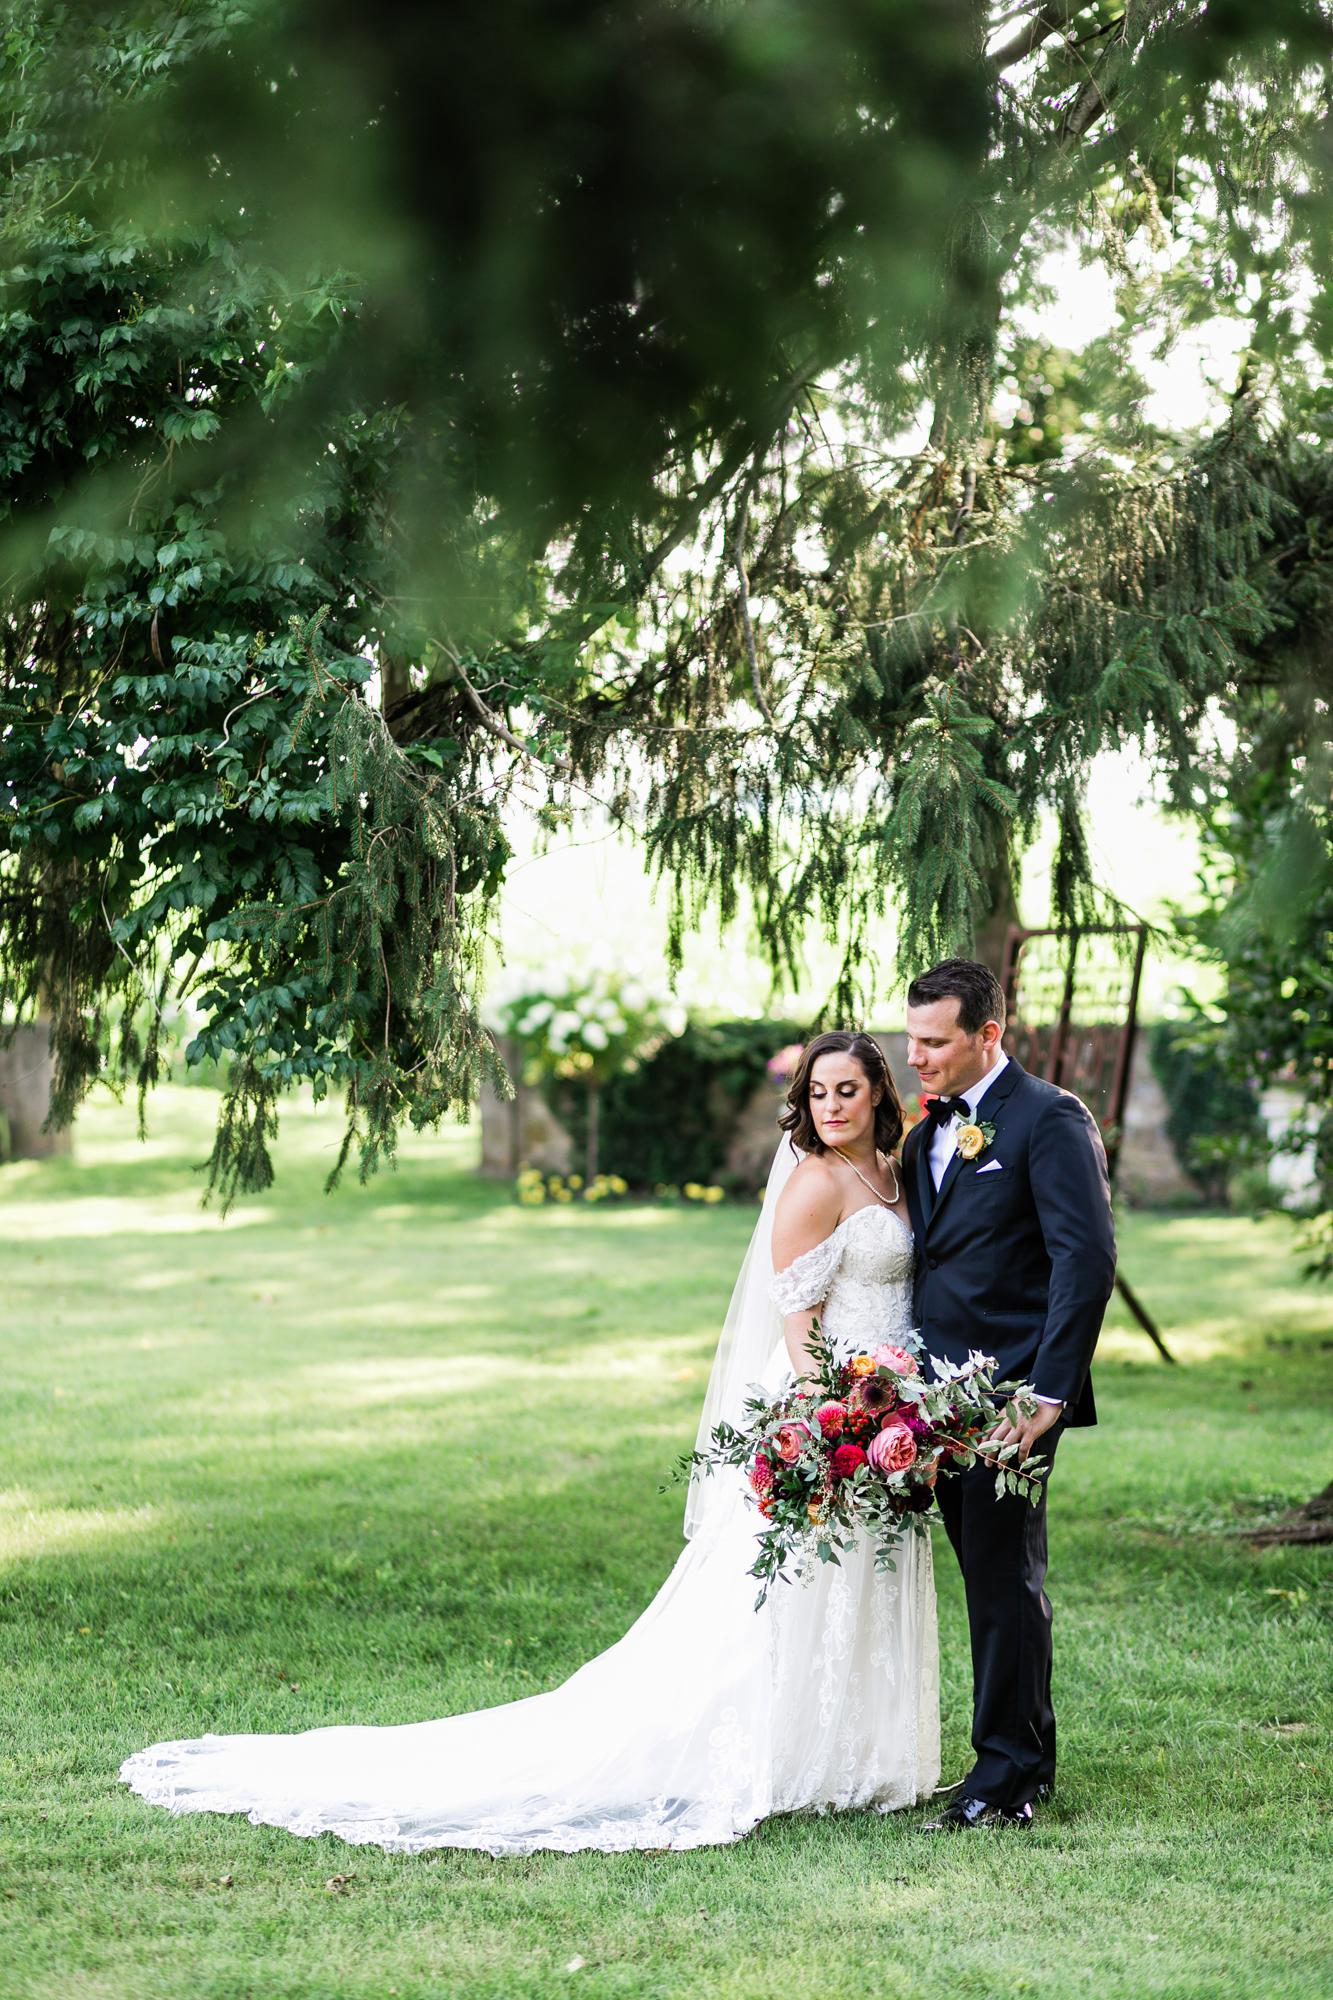 Hotel Du Village - LoveStruck Pictures - Wedding Photography-045.jpg